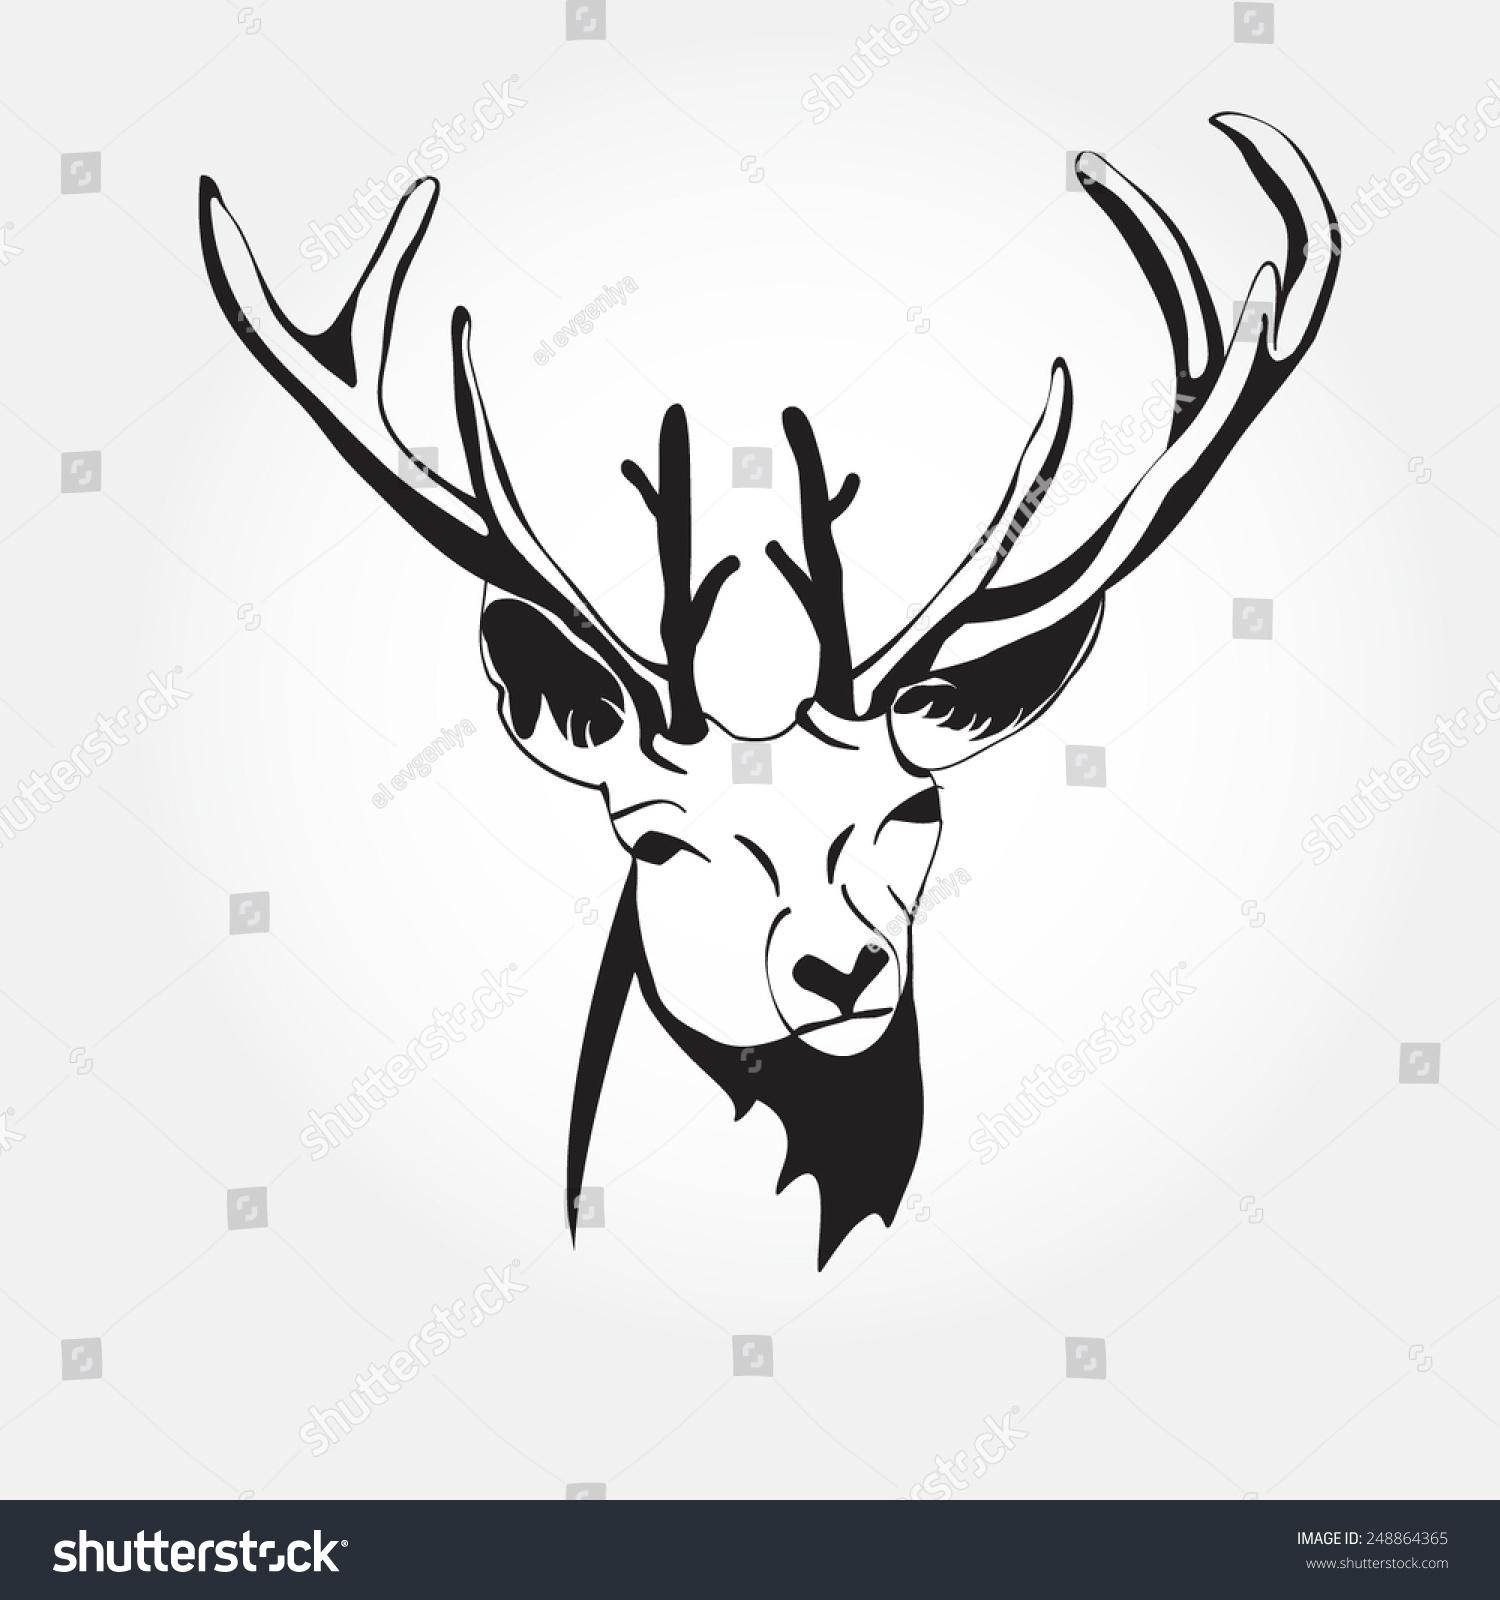 Deer illustration black and white - photo#32